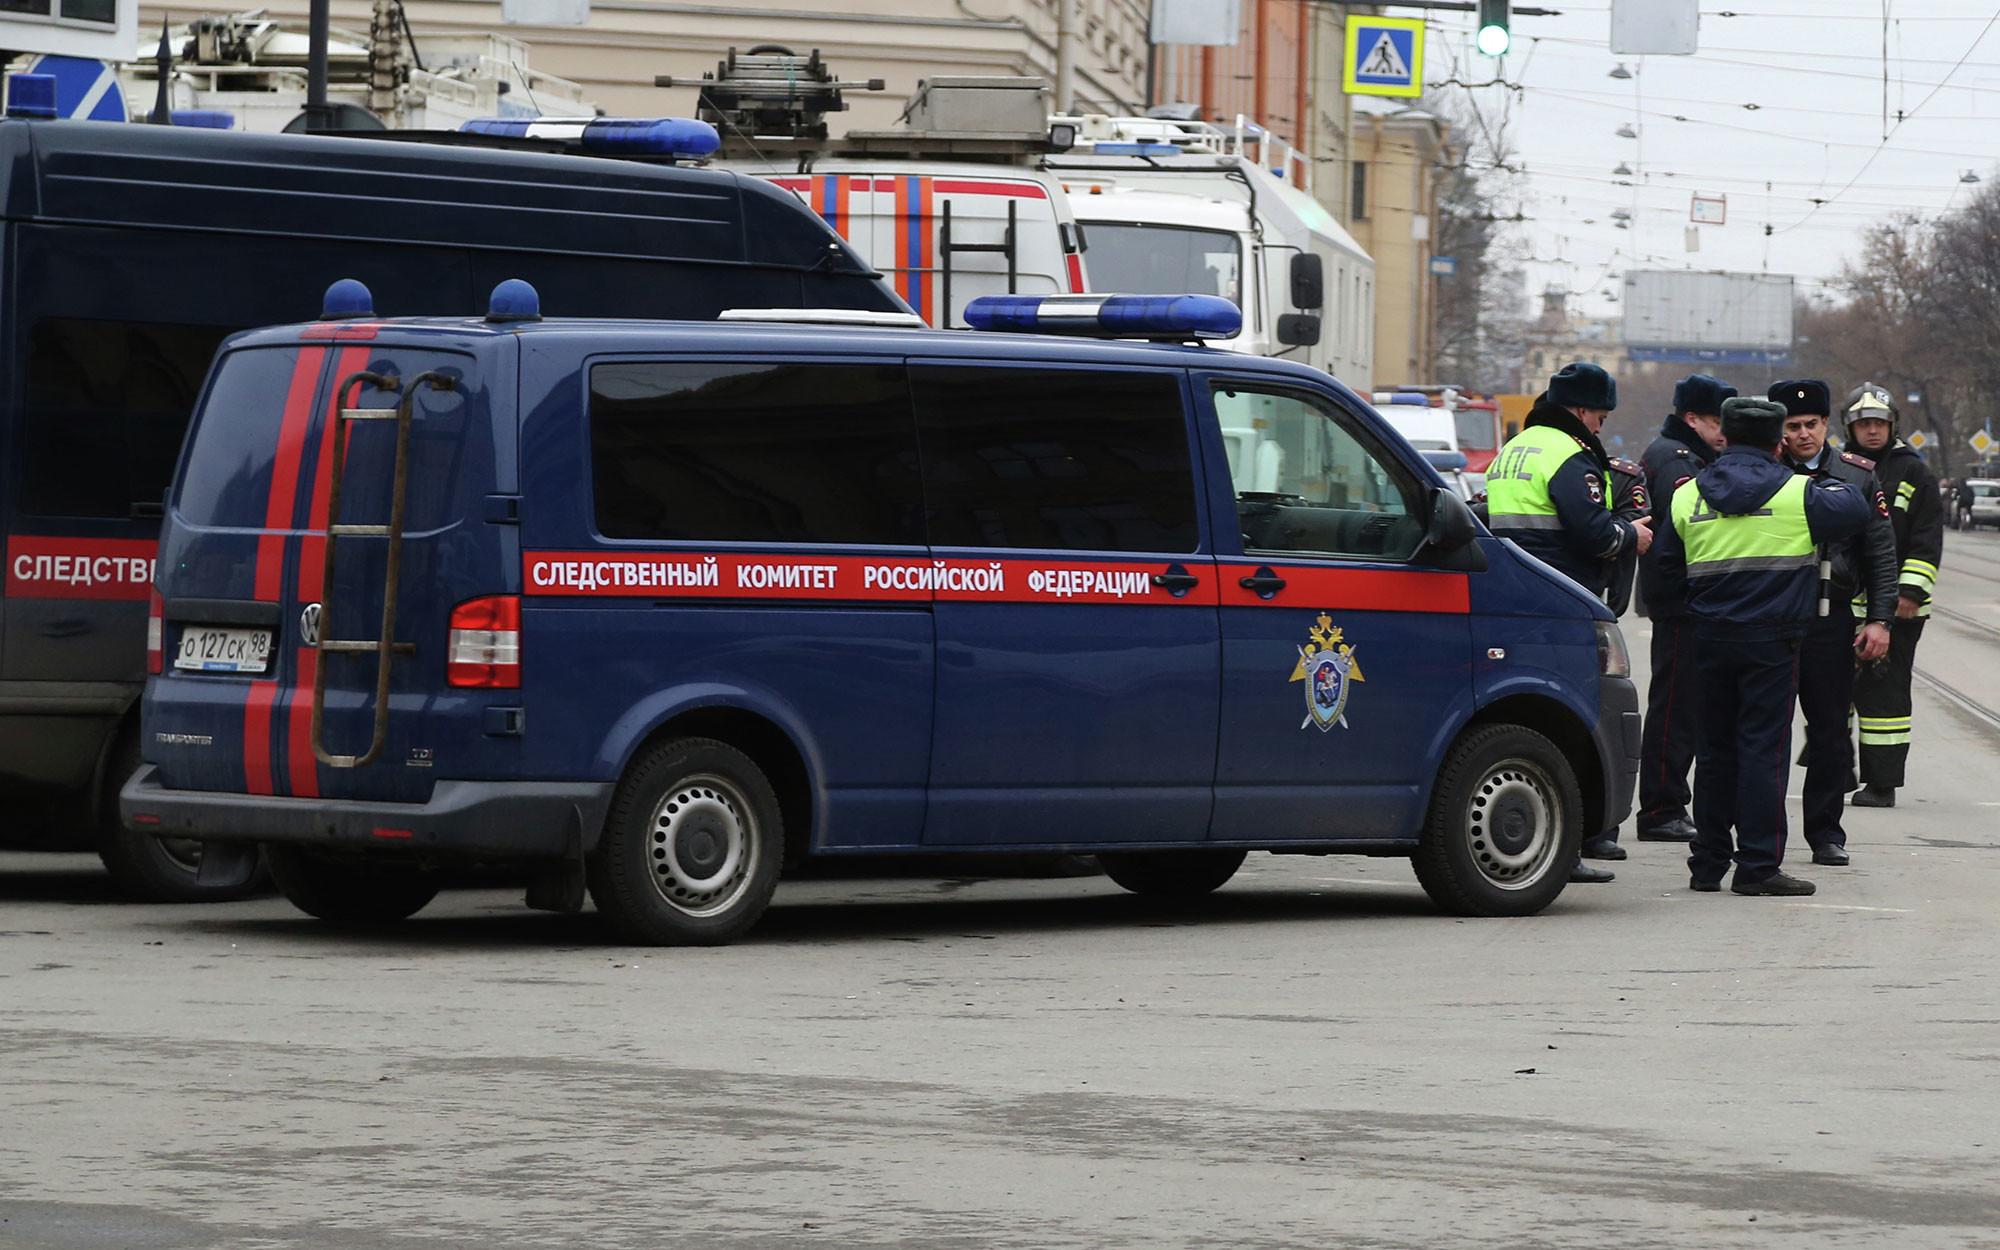 Фото: ©РИА Новости / Виктория Виатрис